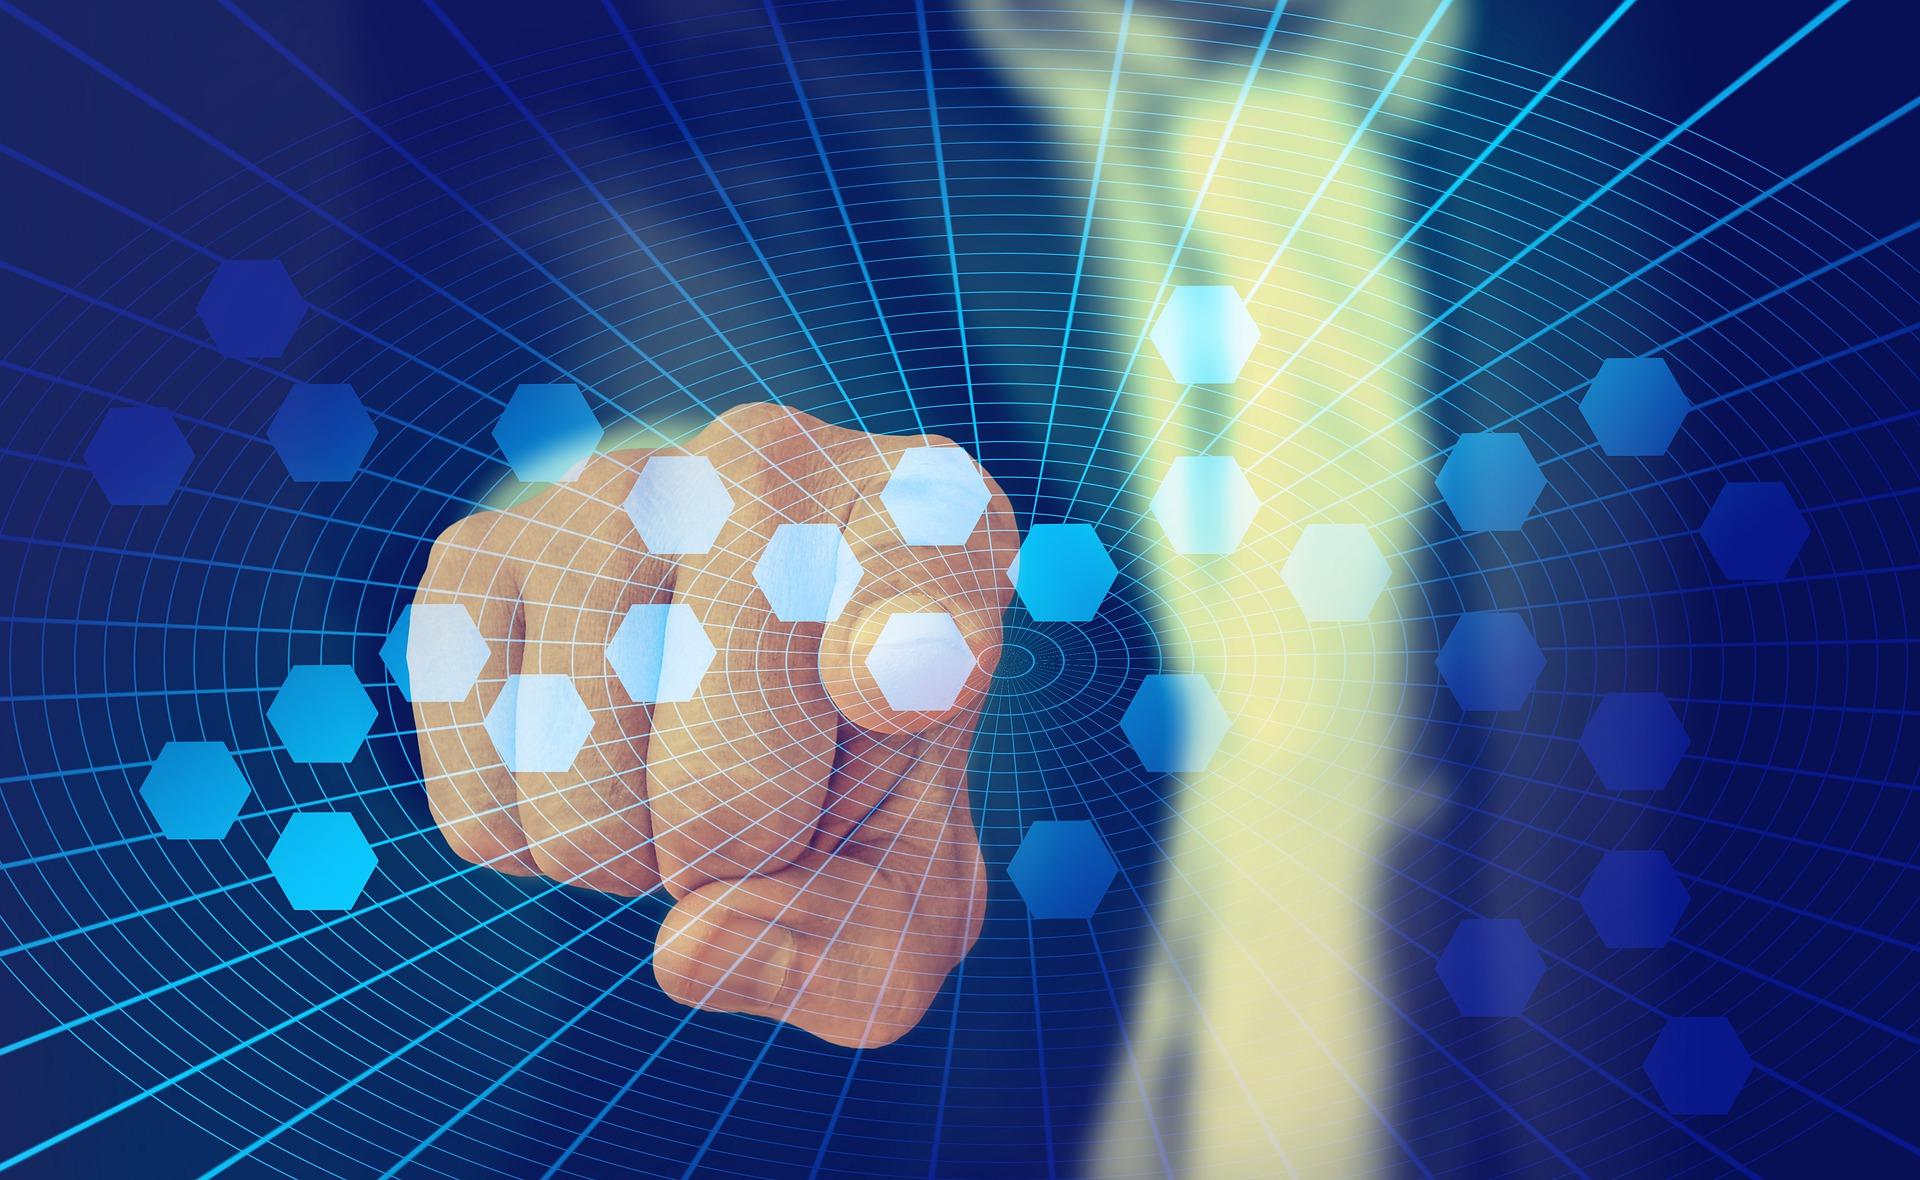 Fintech podrían llegar a 6 millones de usuarios